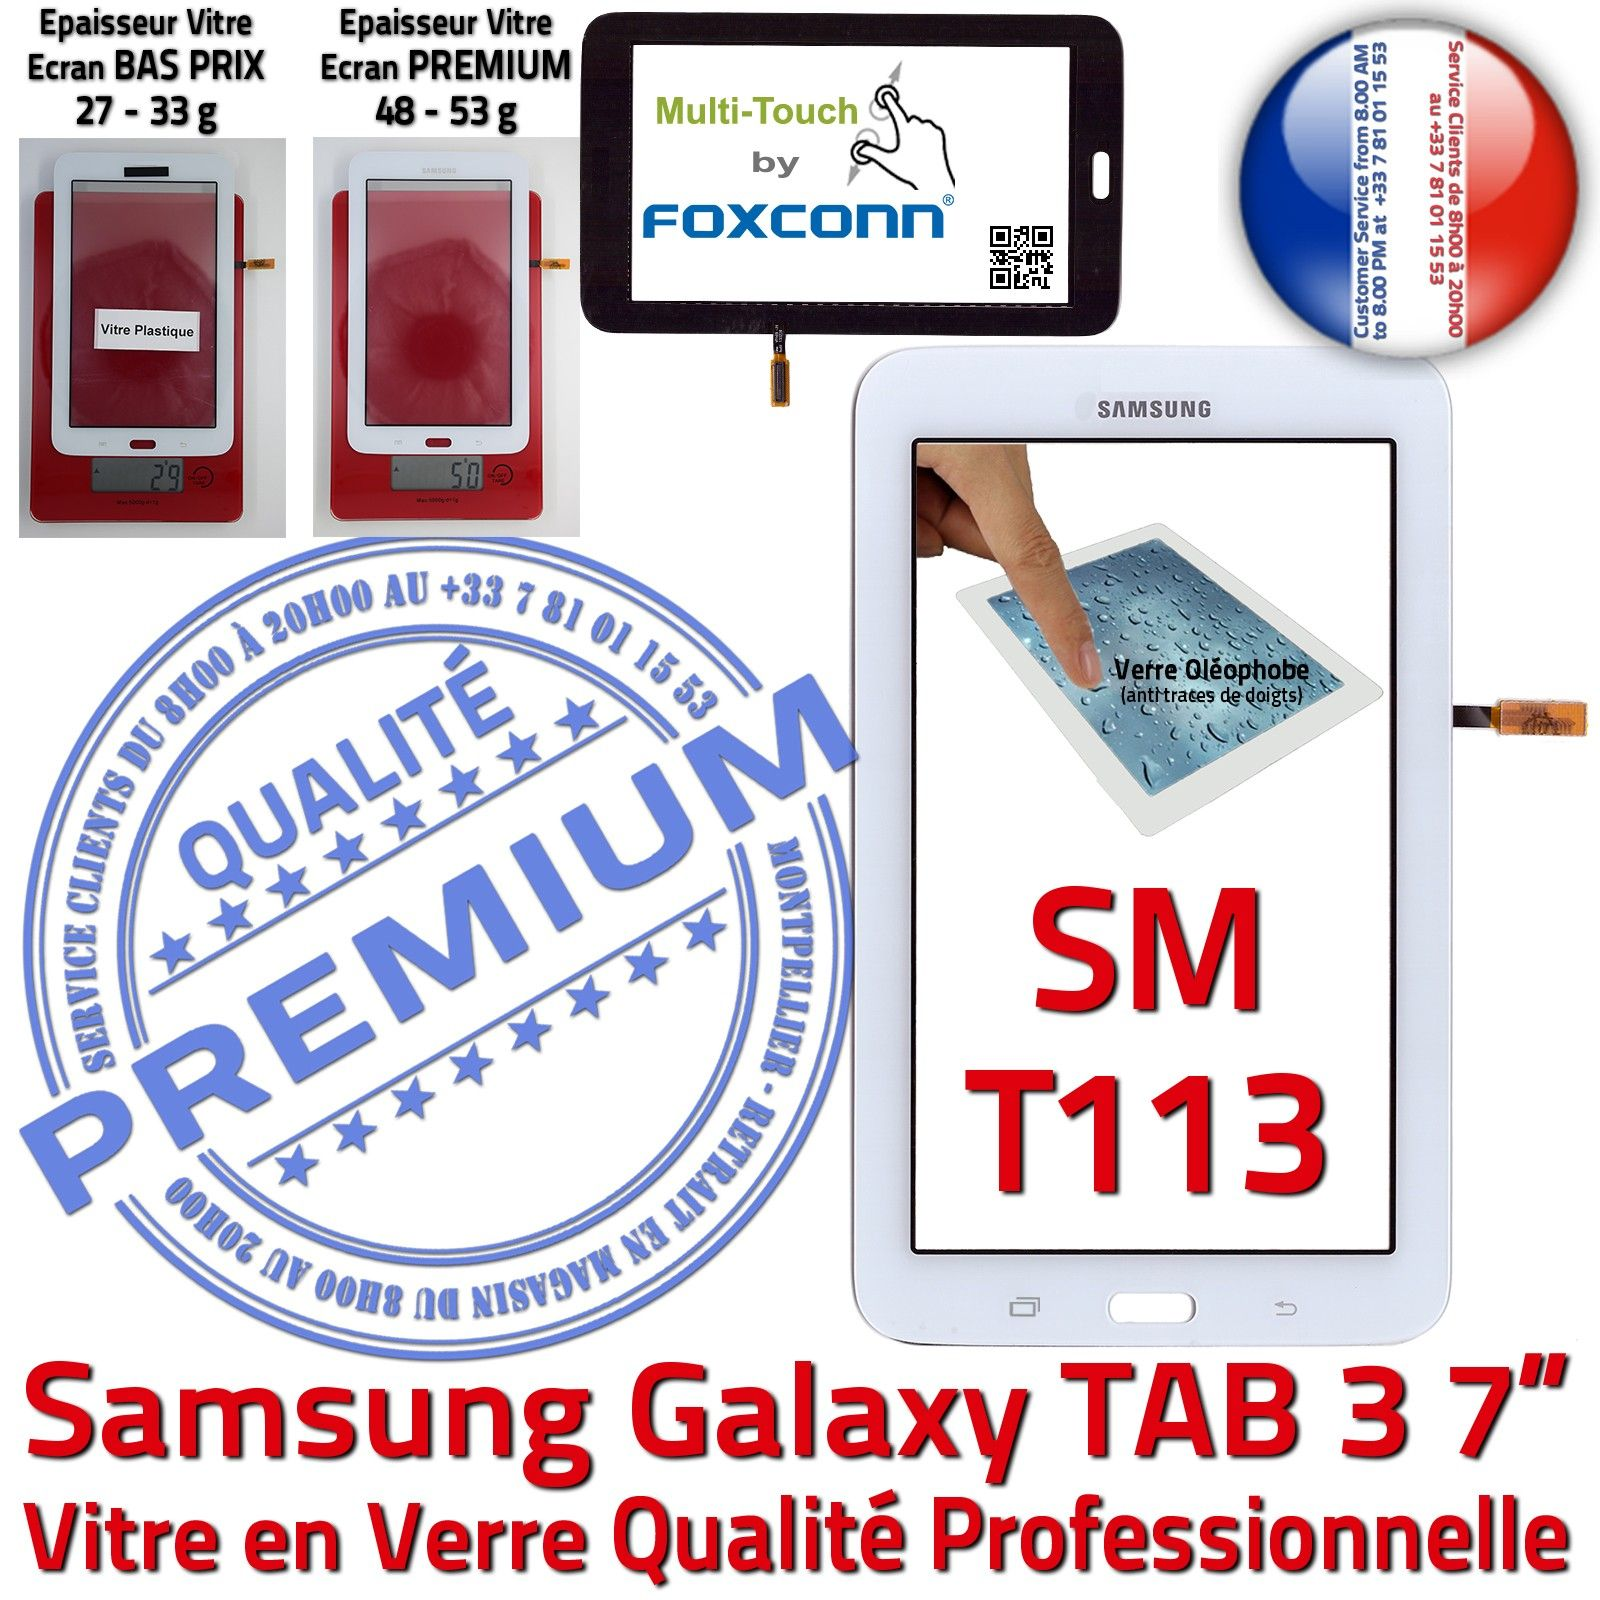 Samsung galaxy tab3 sm t113 lite vitre tactile blanche en - Difference entre note 3 et note 3 lite ...